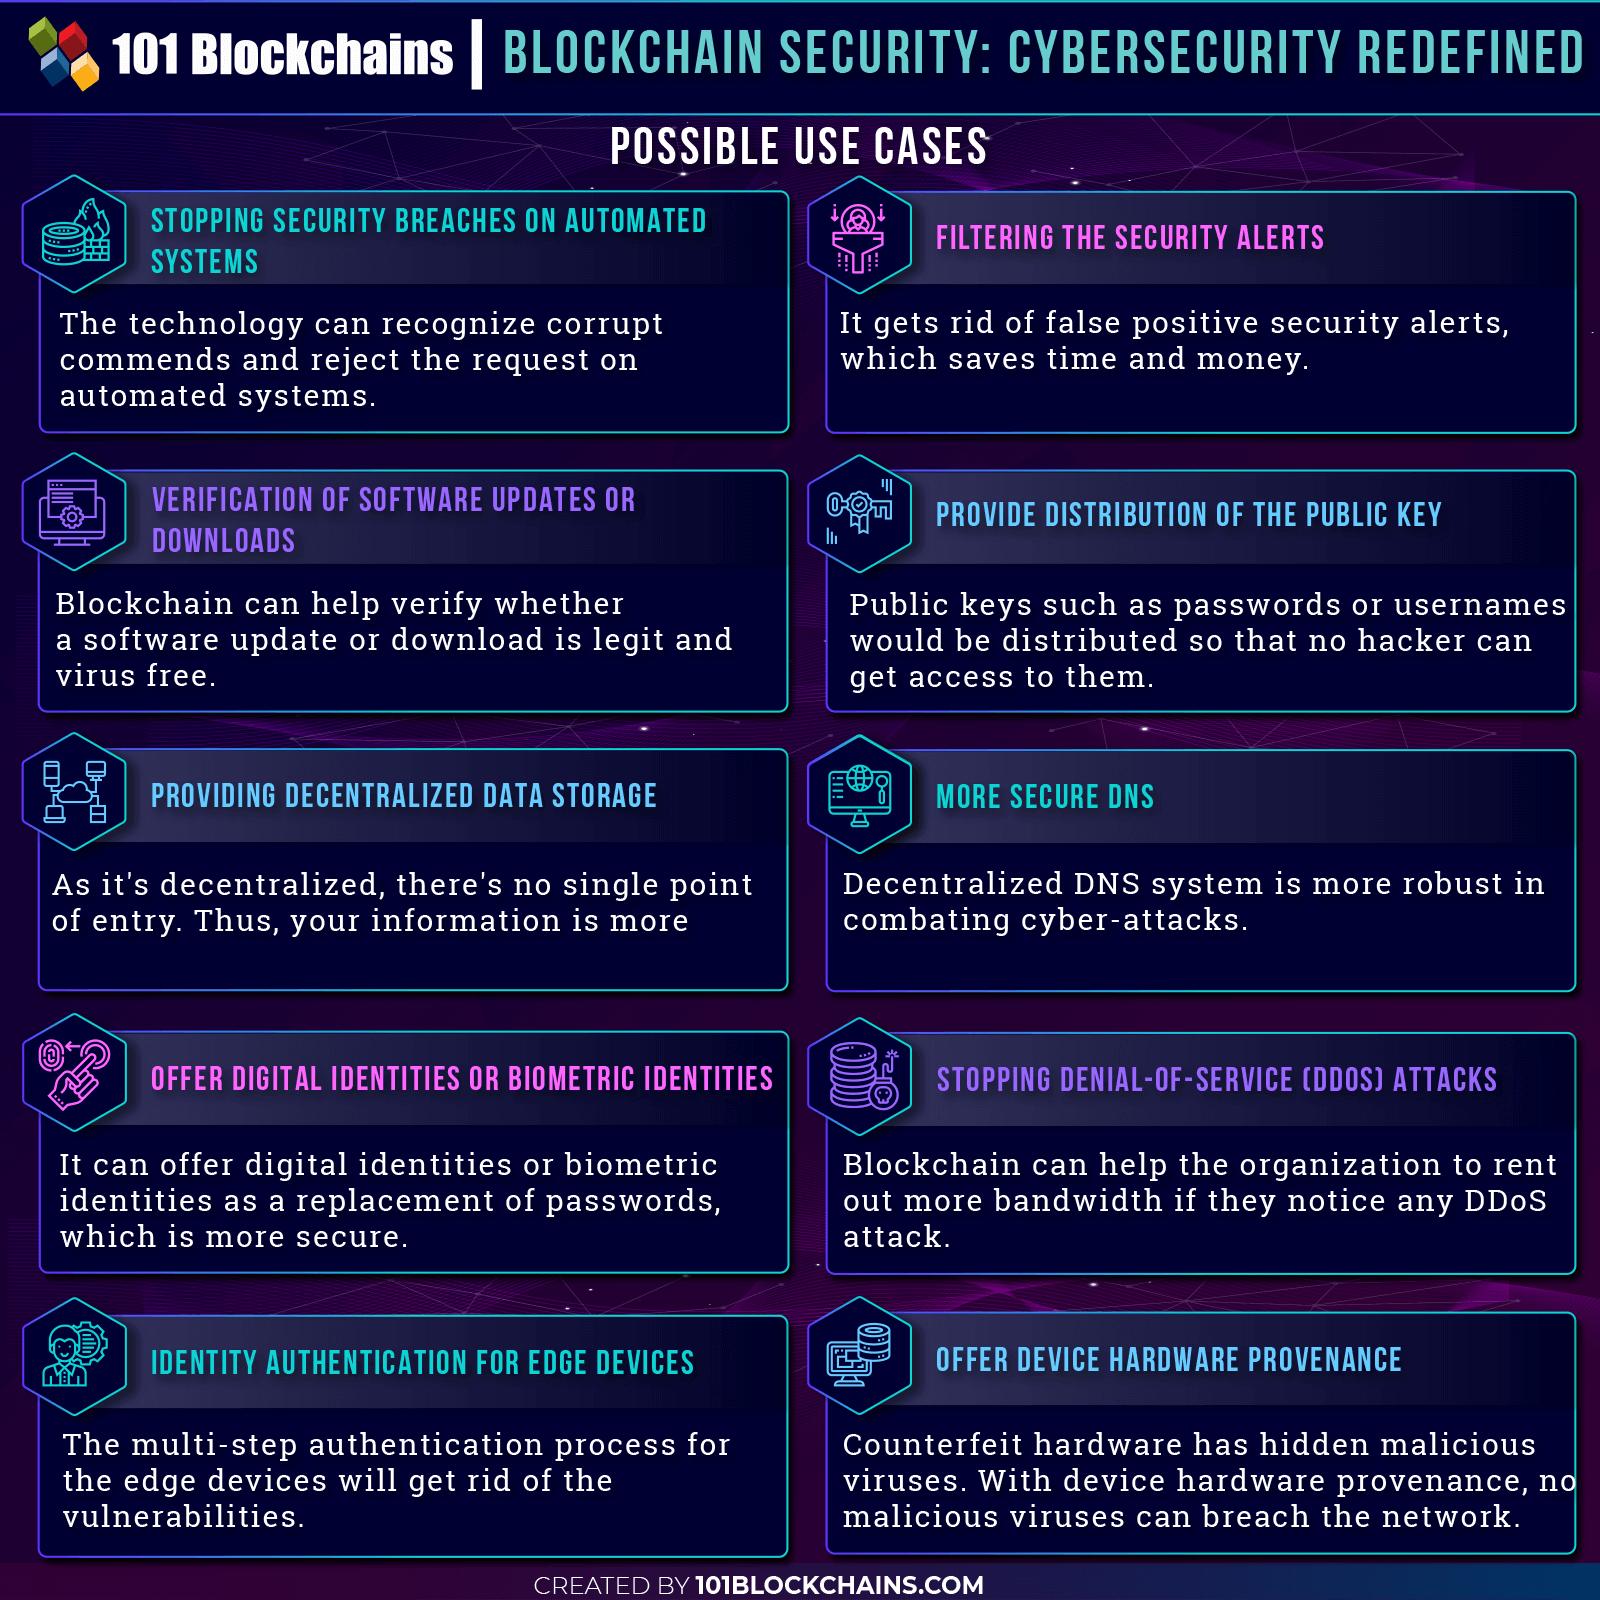 Blockchain Security: Premium Protection For Enterprises